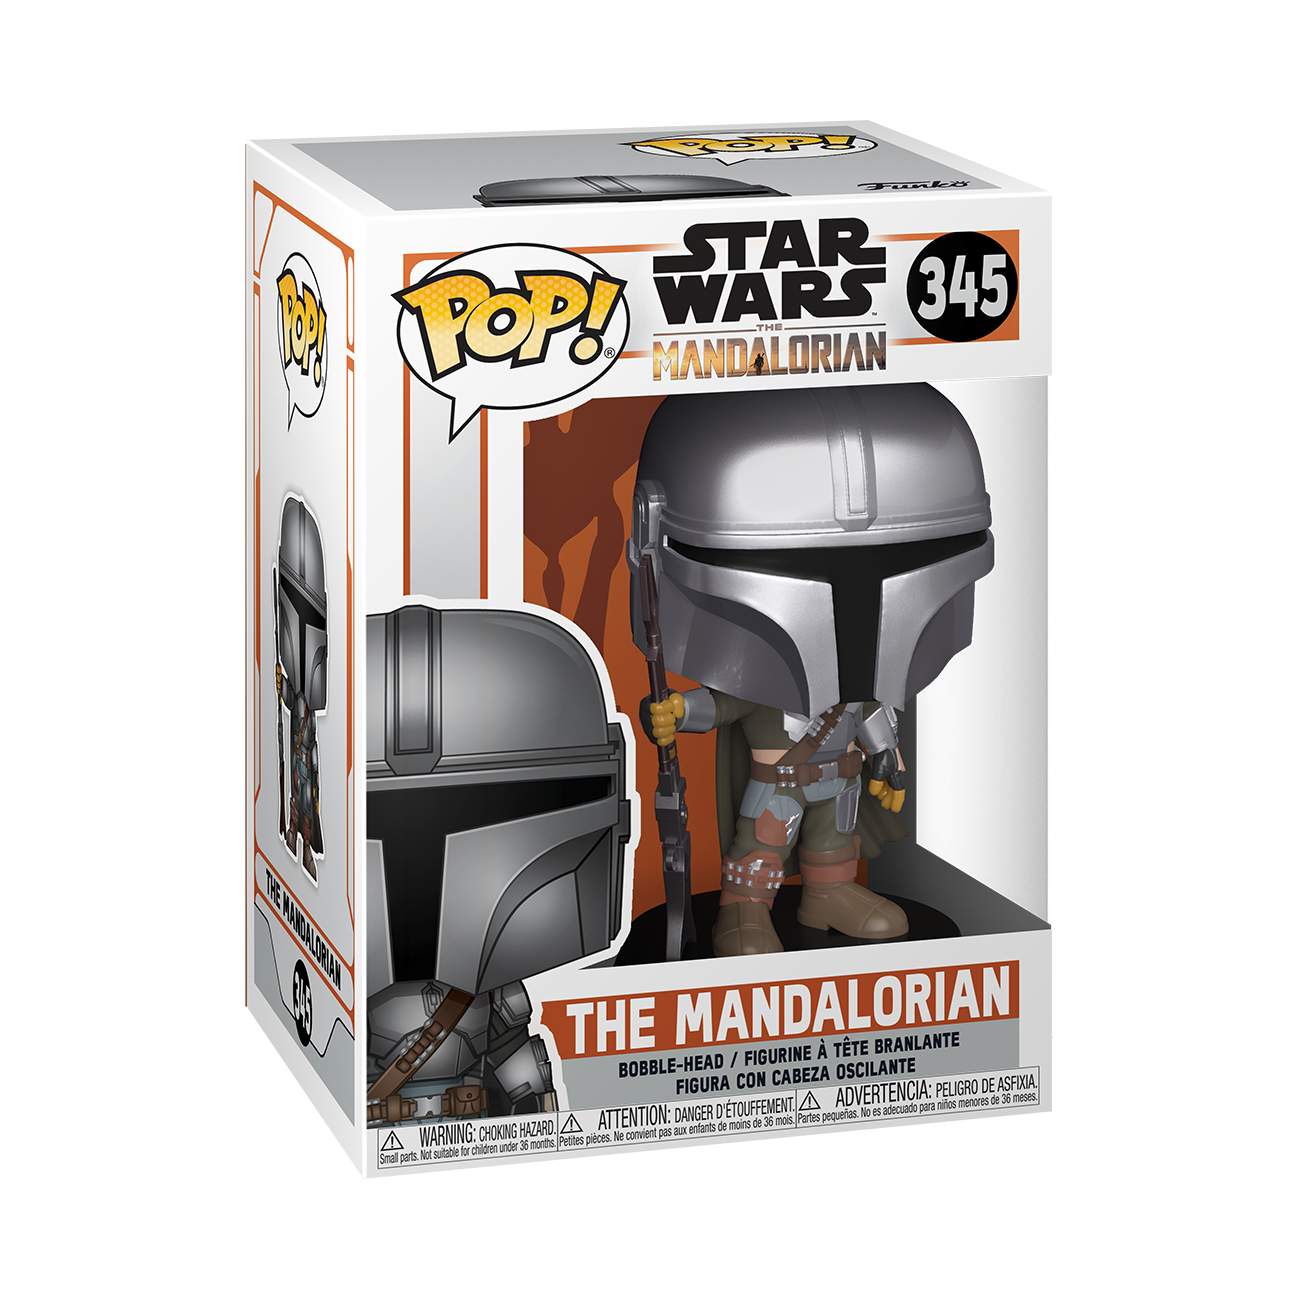 Star Wars: The Mandalorian (Metallic) - Pop! Vinyl Figure image